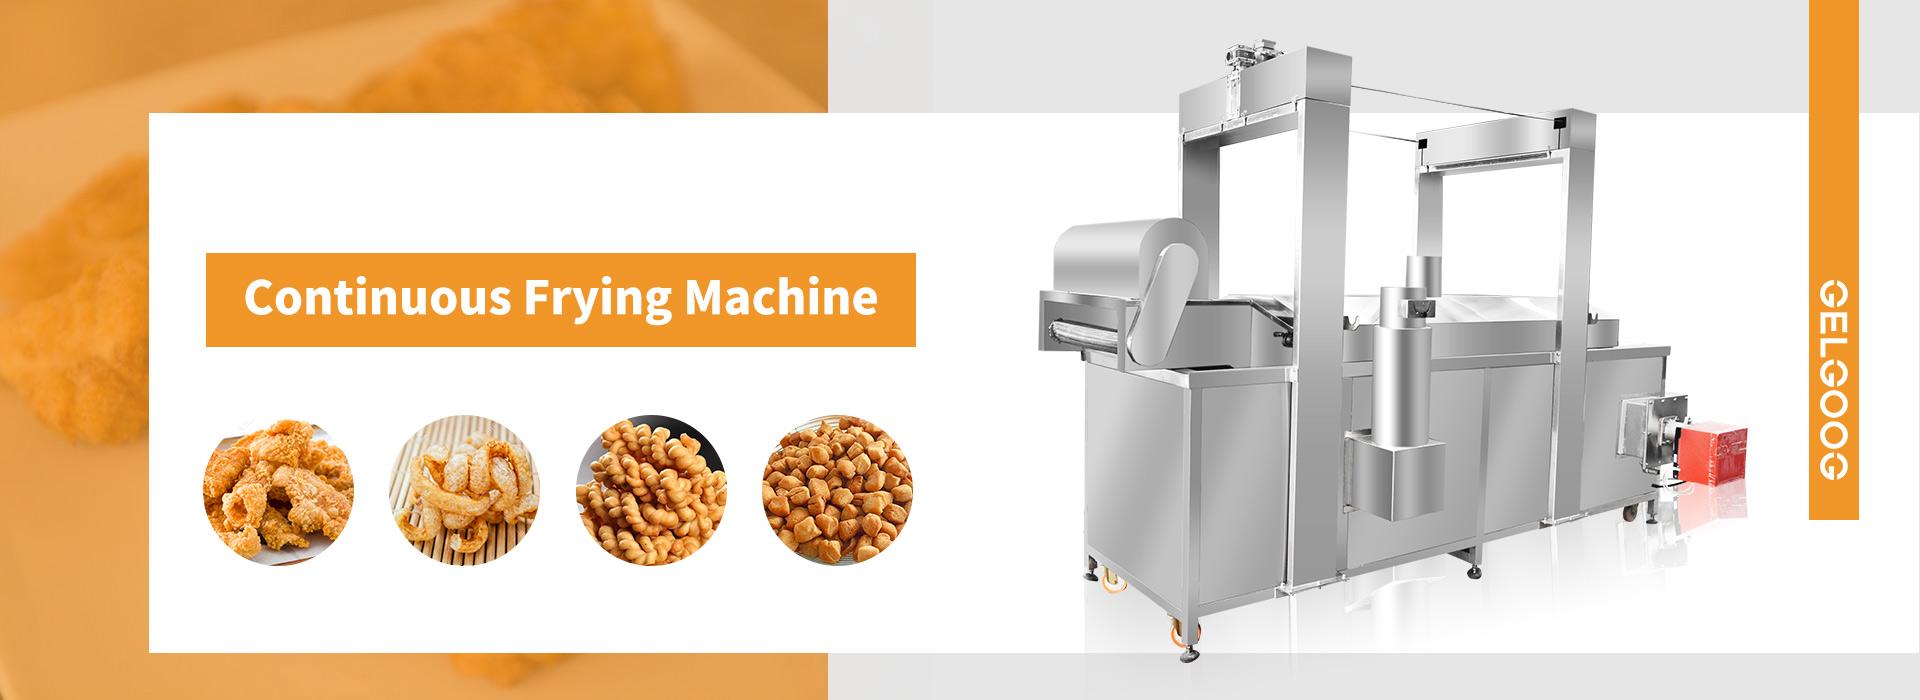 Professional Frying Machine Manufacturer